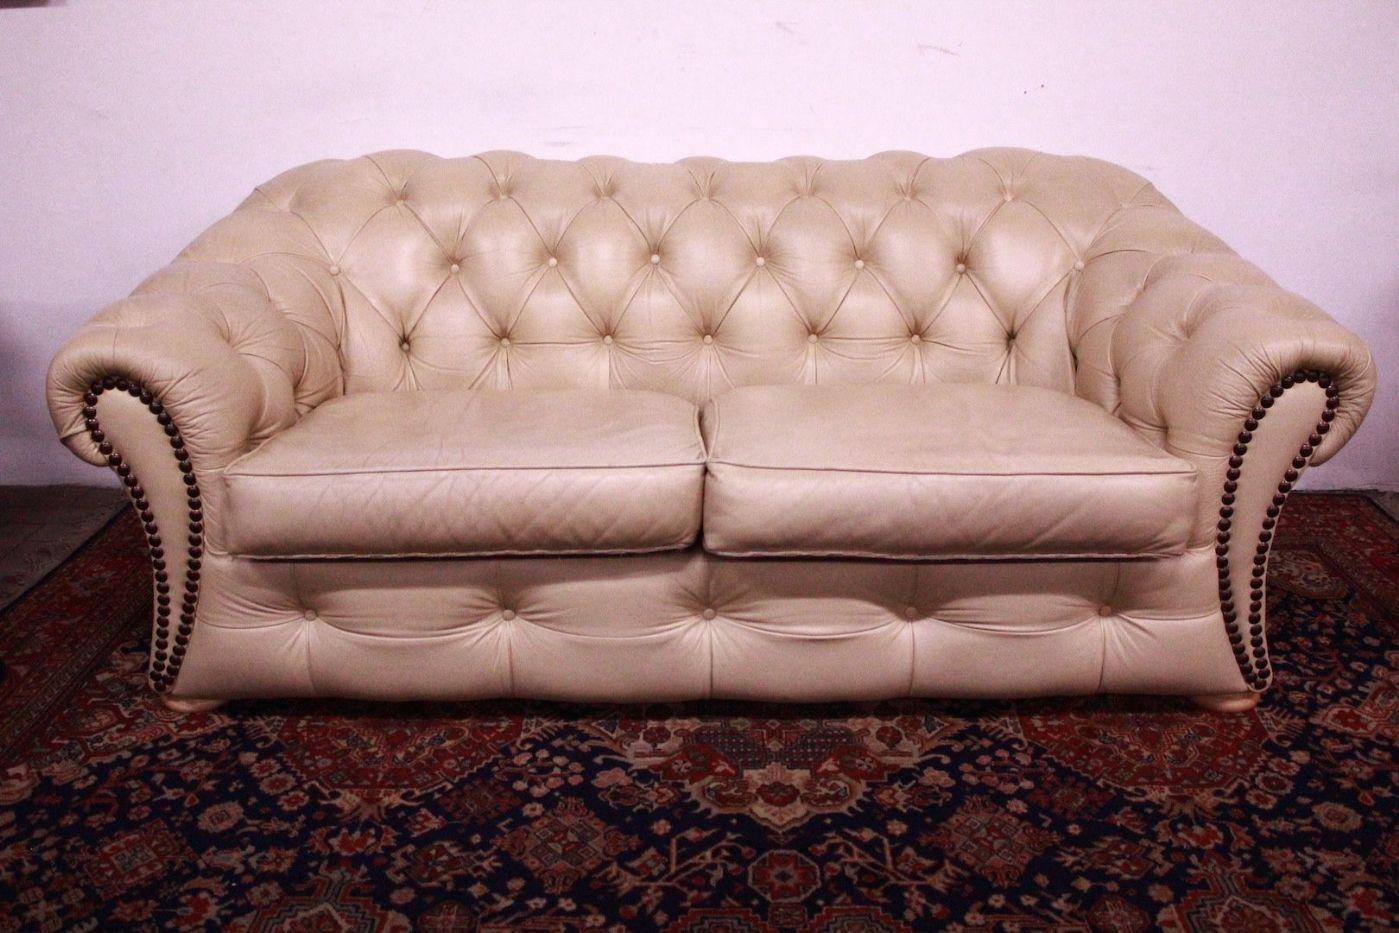 Full Size of Sofa Englisch Bel Chesterfield Chester 3 Pltze Original Ledercreme Eck 3er Grau Bezug Ecksofa Xxl U Form 2 Sitzer Mit Relaxfunktion Kissen Beziehen Canape Sofa Sofa Englisch